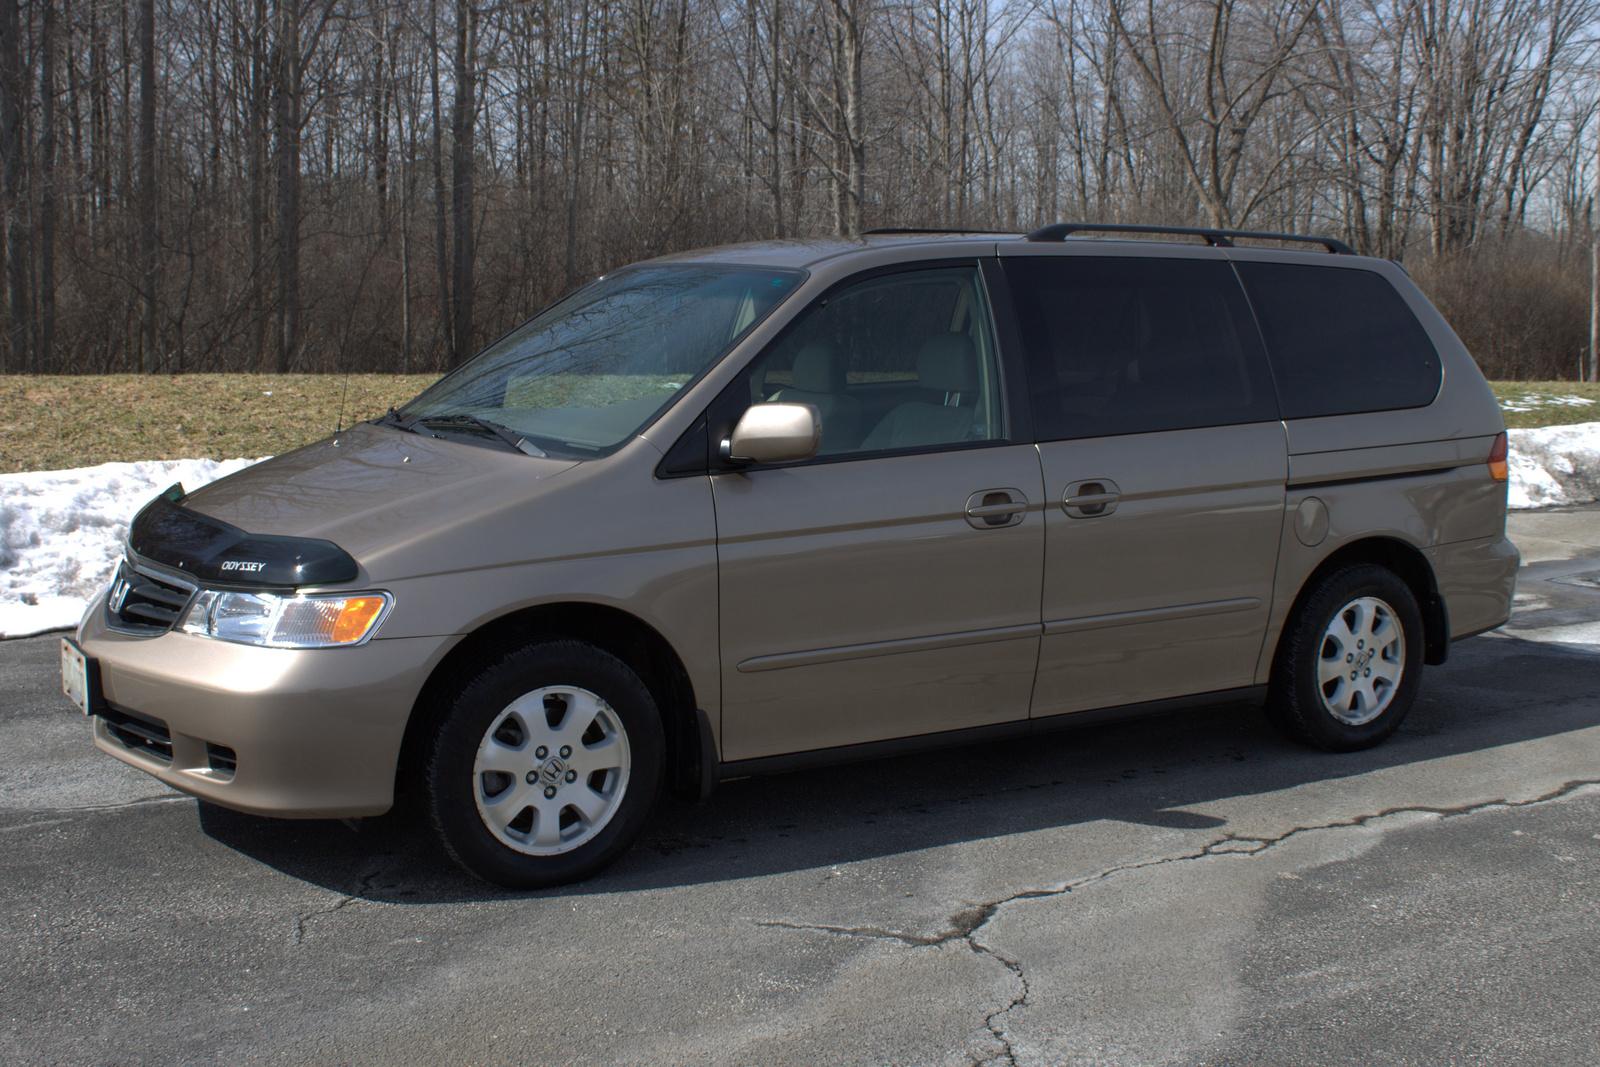 Honda Dealers Columbus >> 2004 Honda Odyssey - Pictures - CarGurus